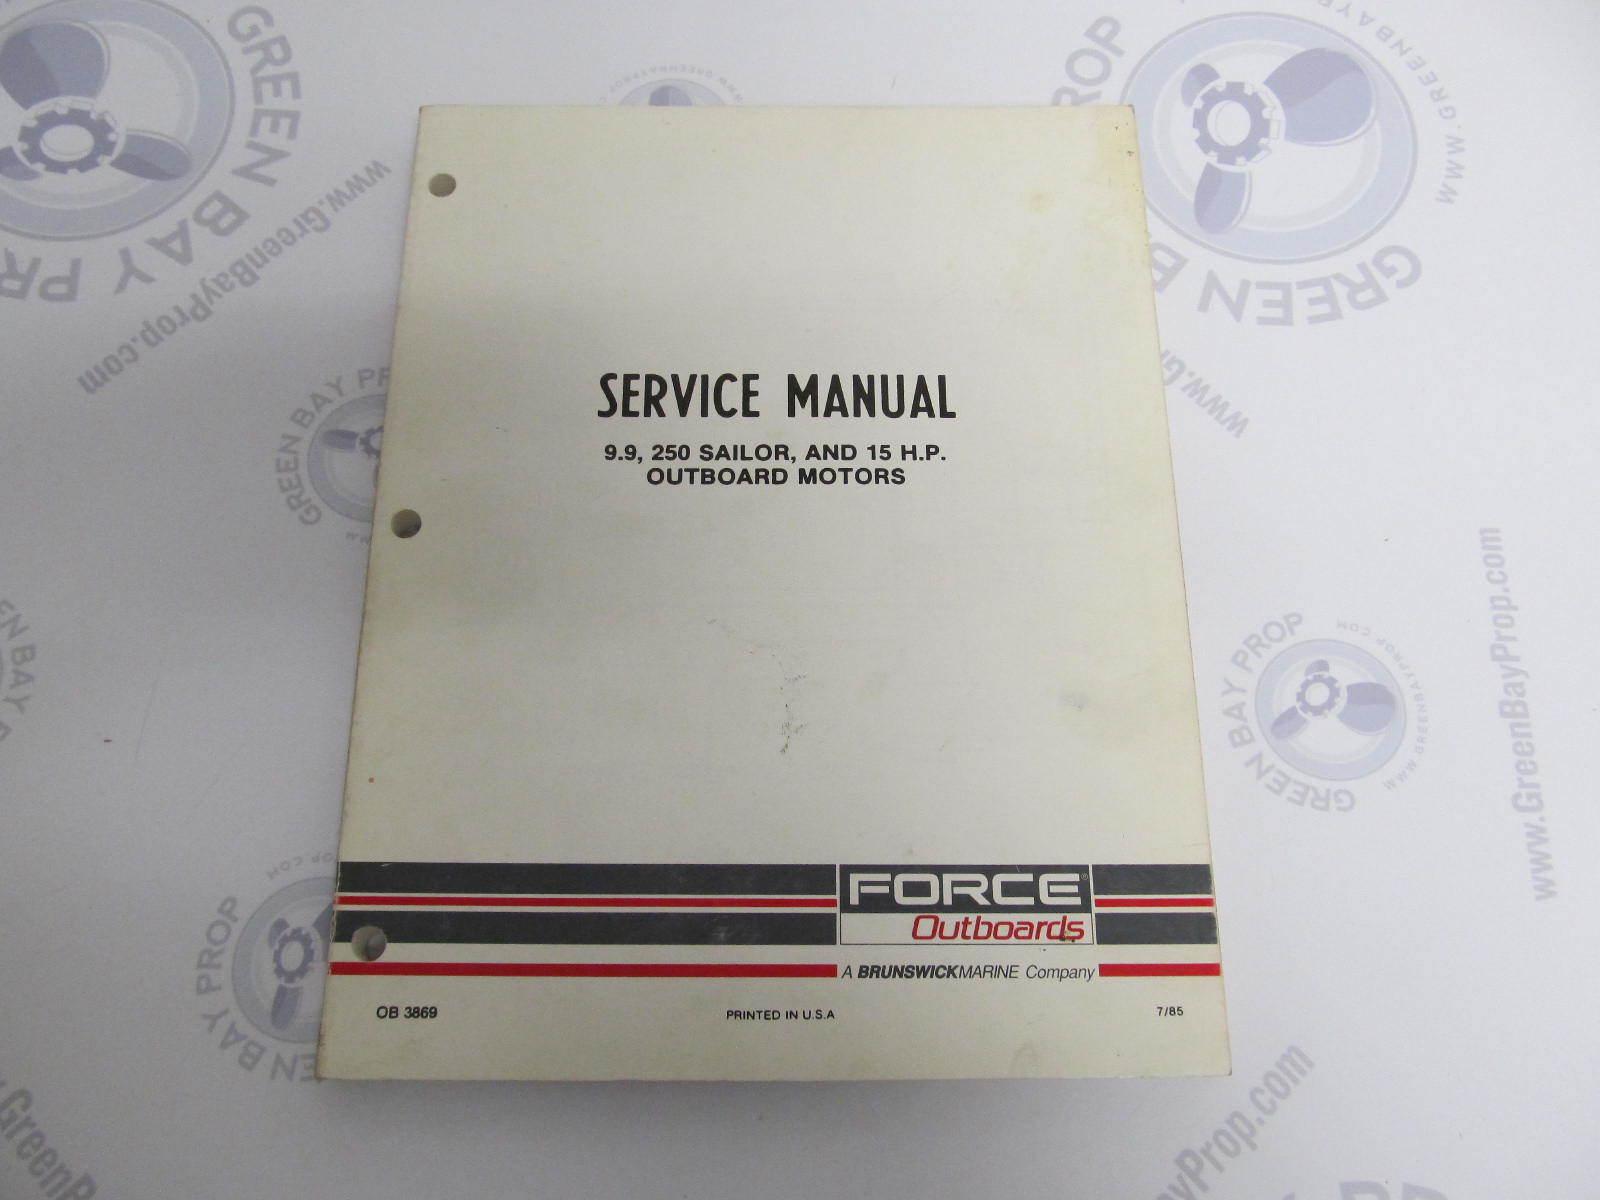 Olympic kiln 2327 manual